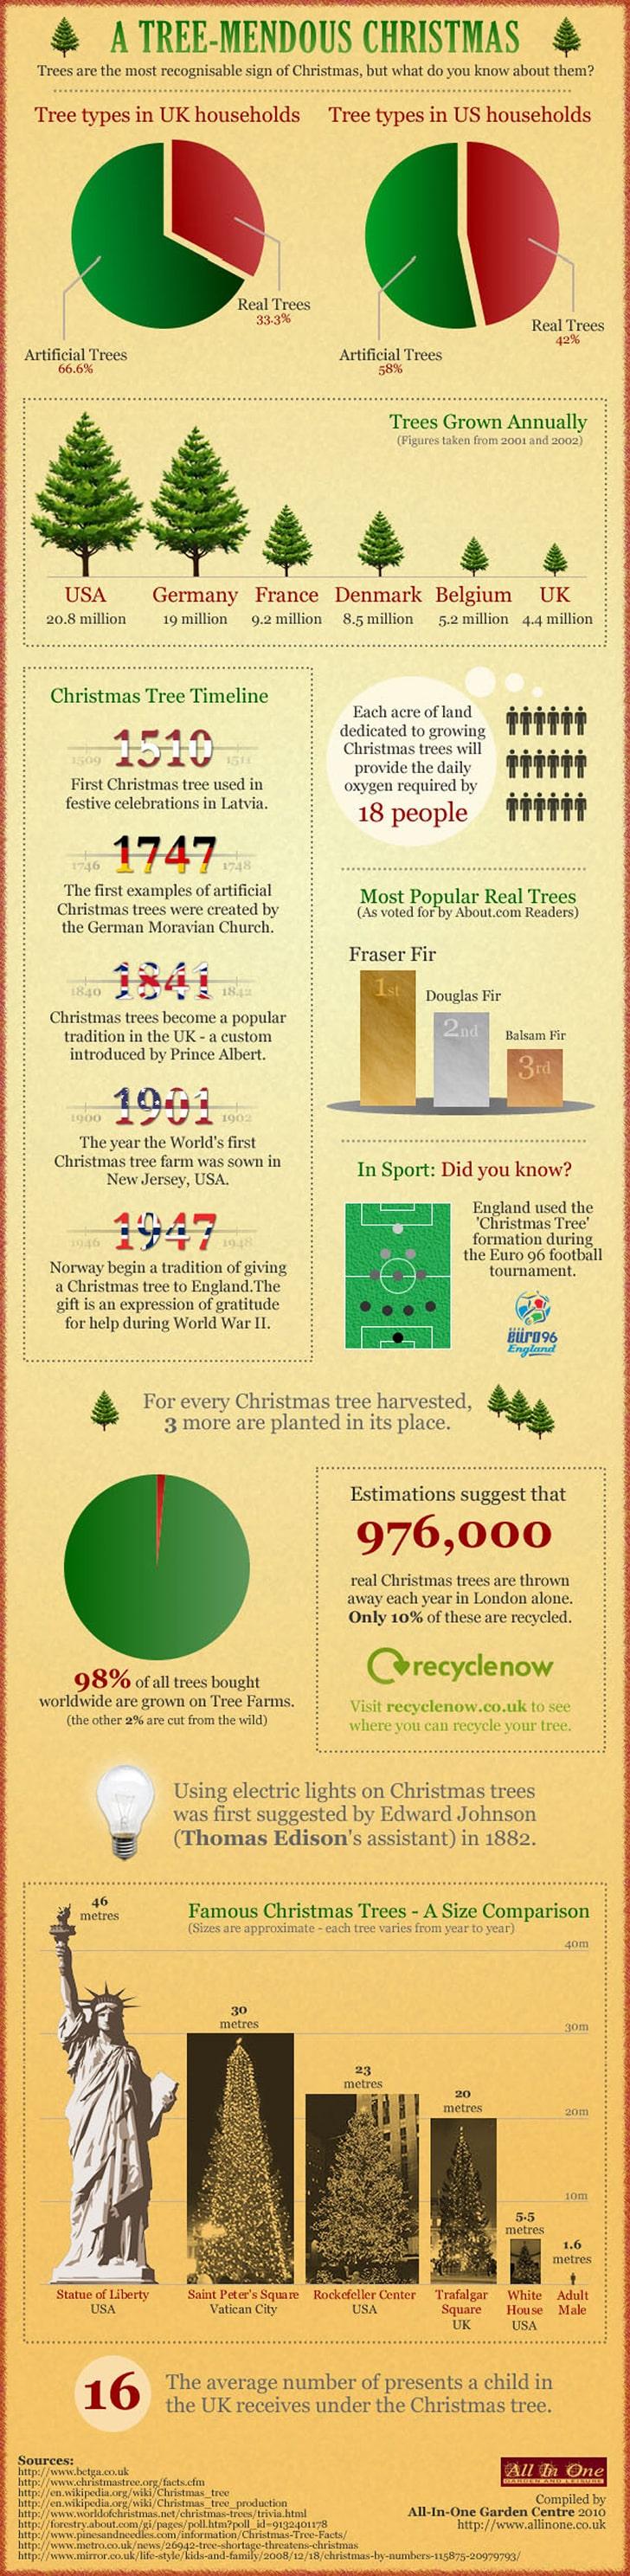 A Treemendous Christmas